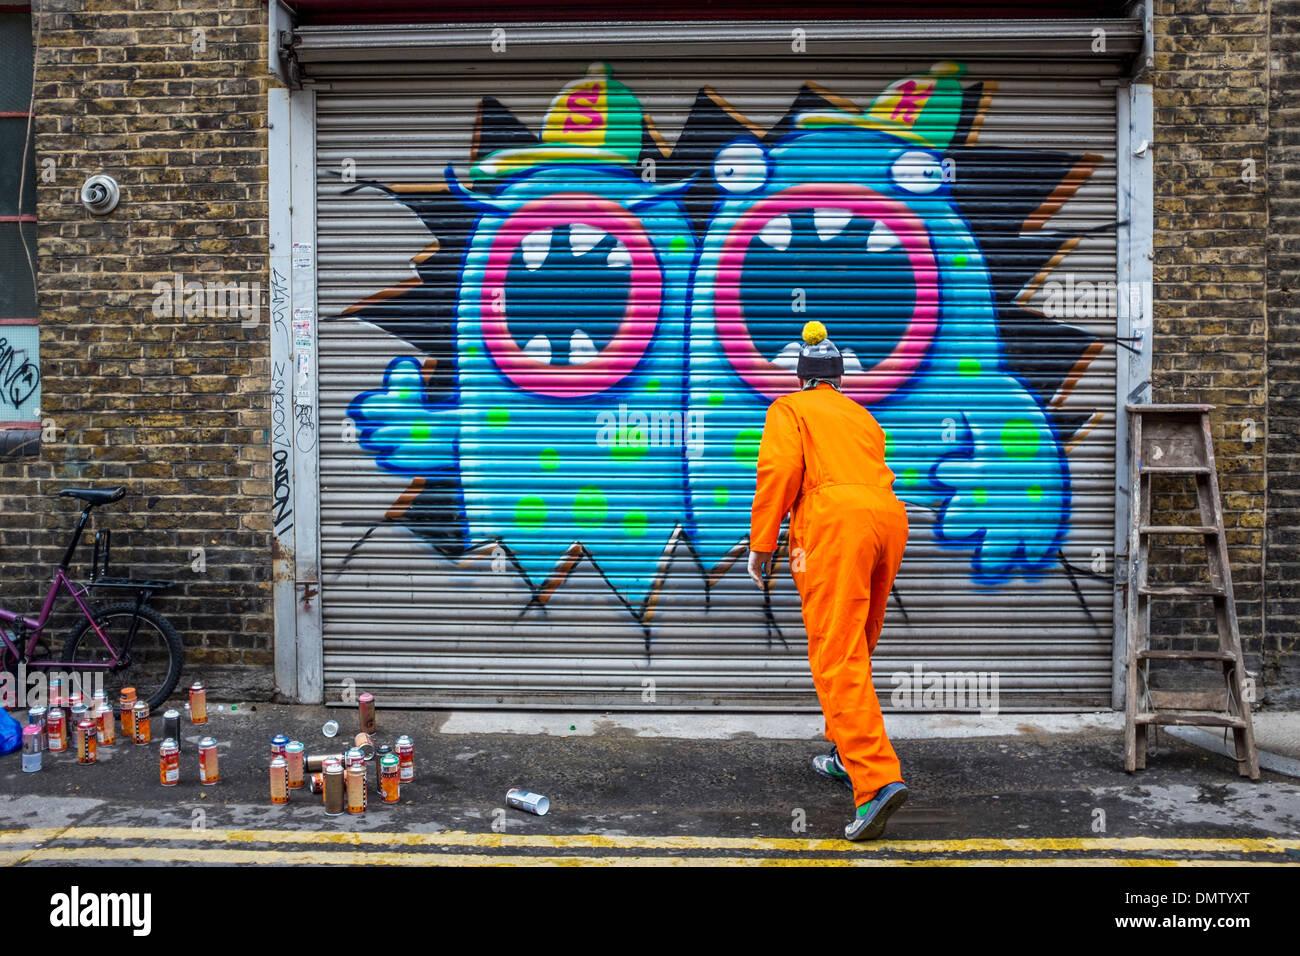 graffiti spray paint uk